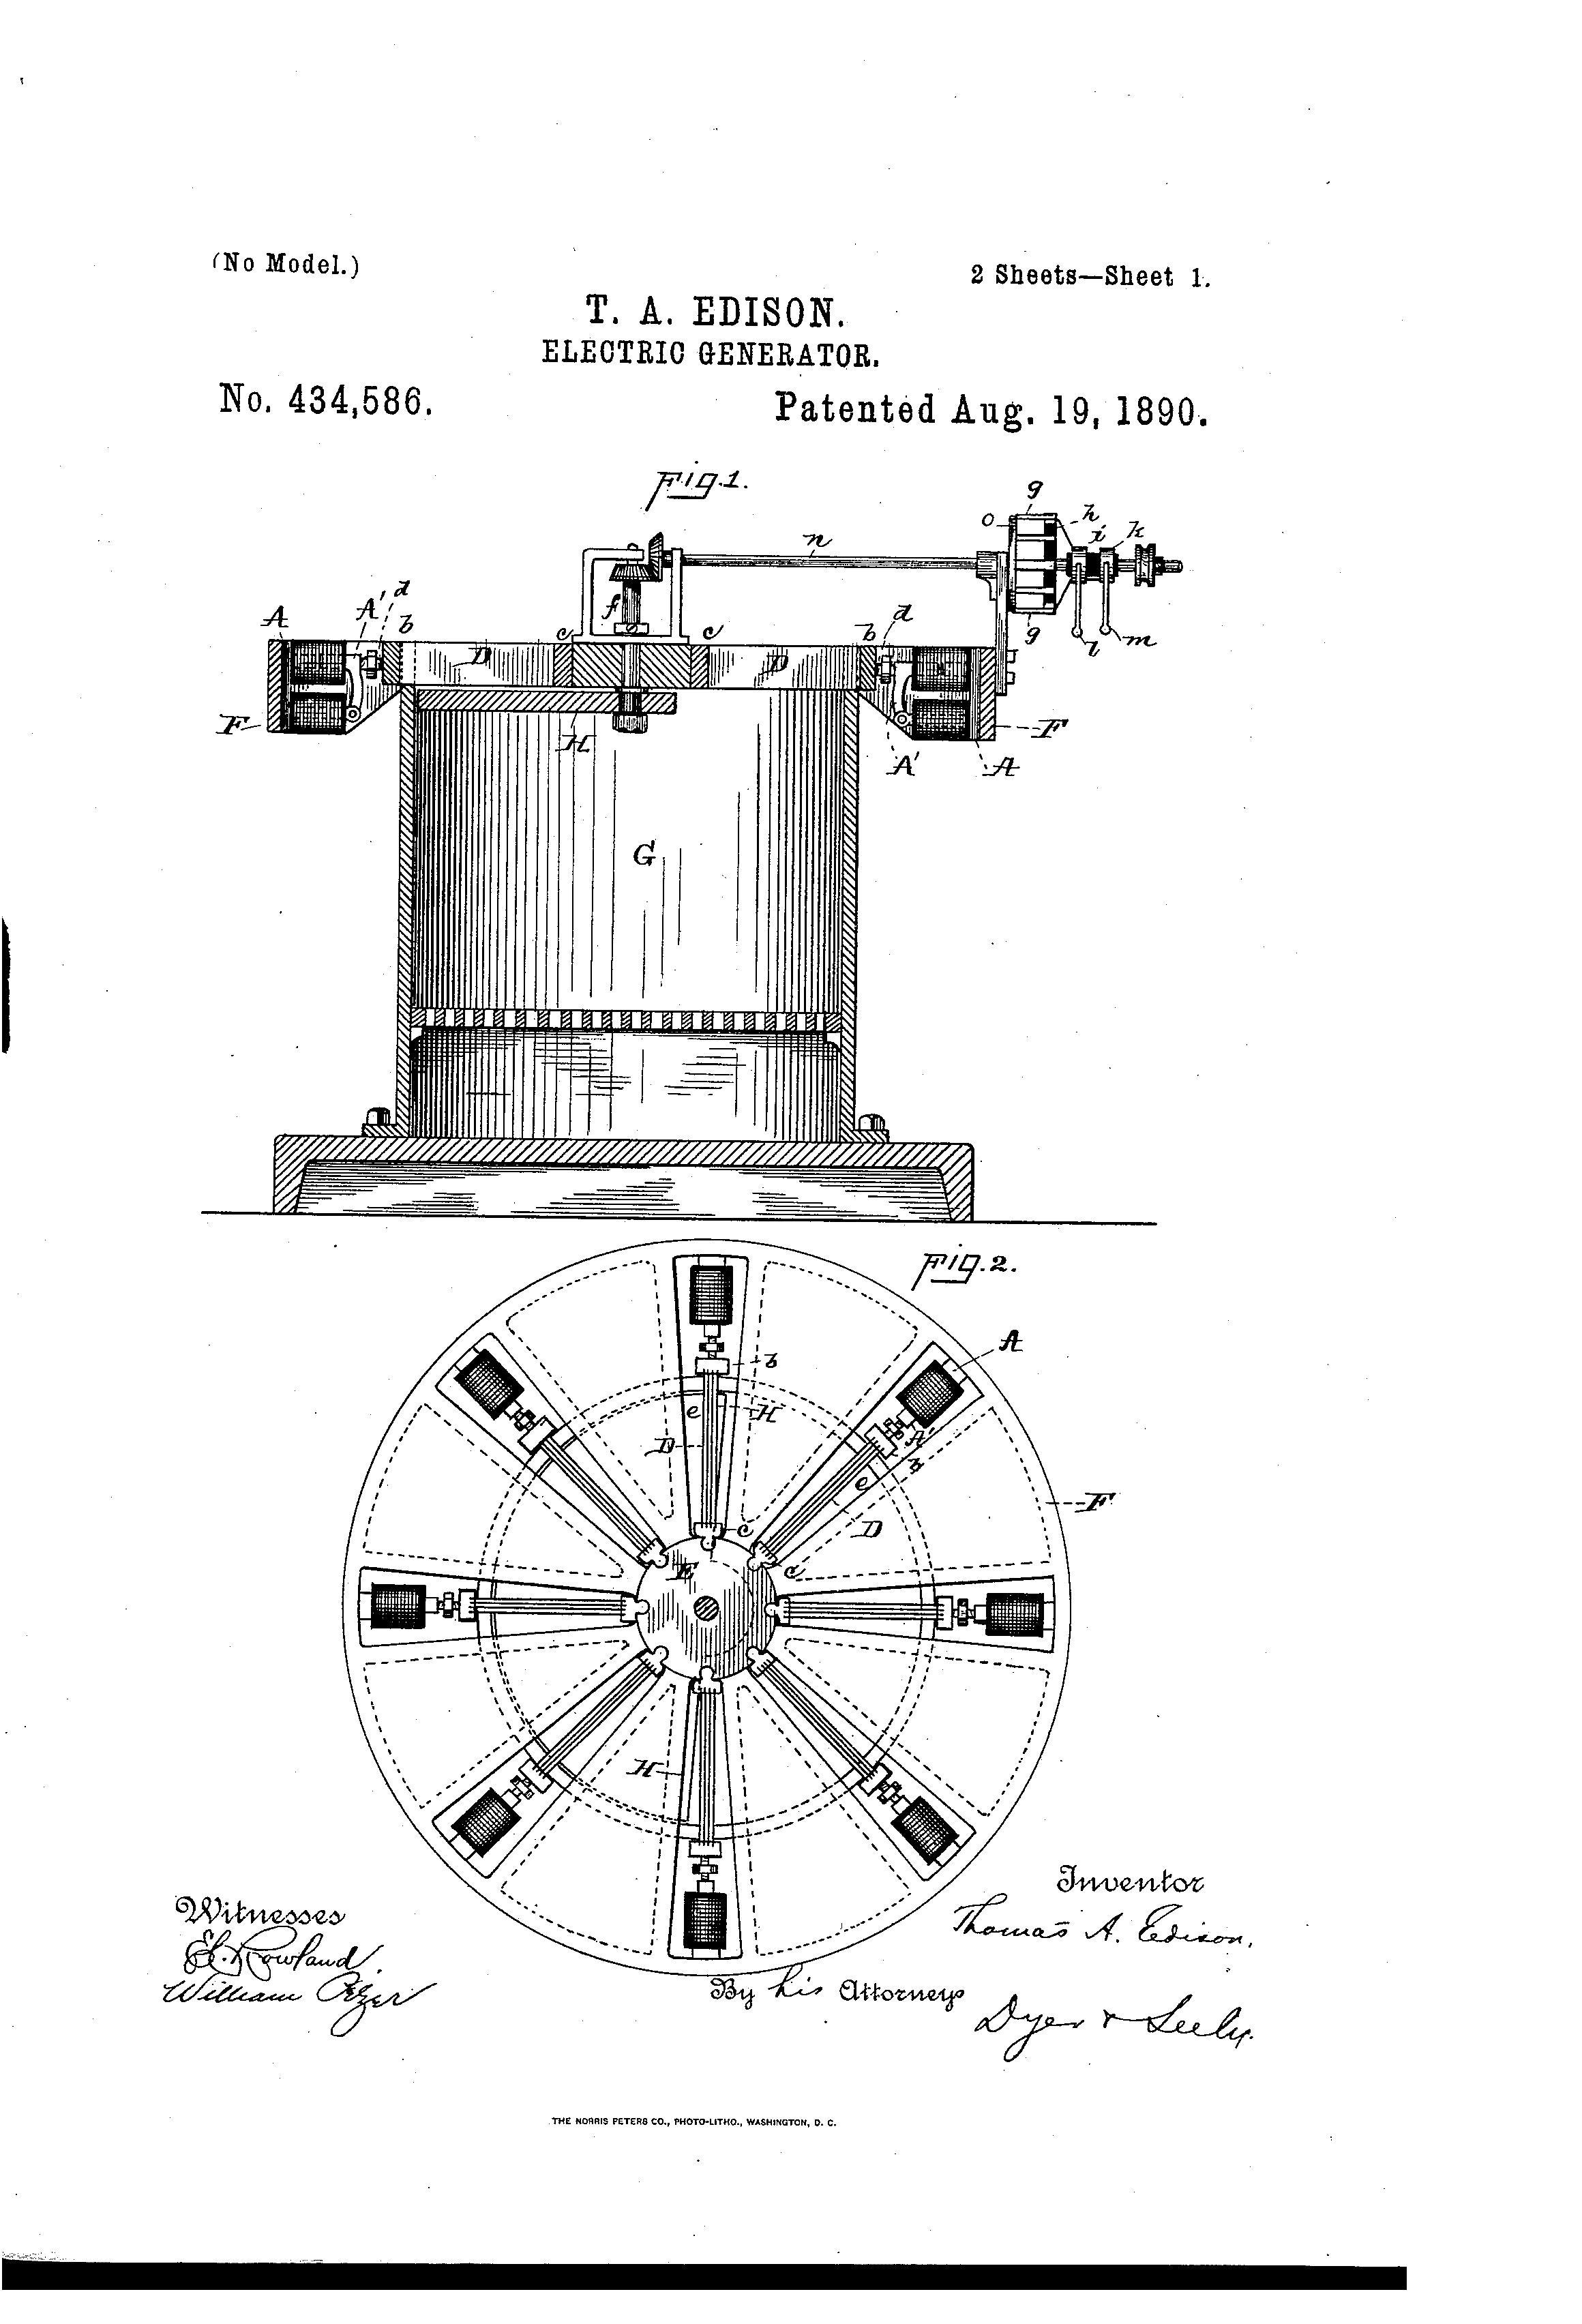 Edison Patents Image Gallery